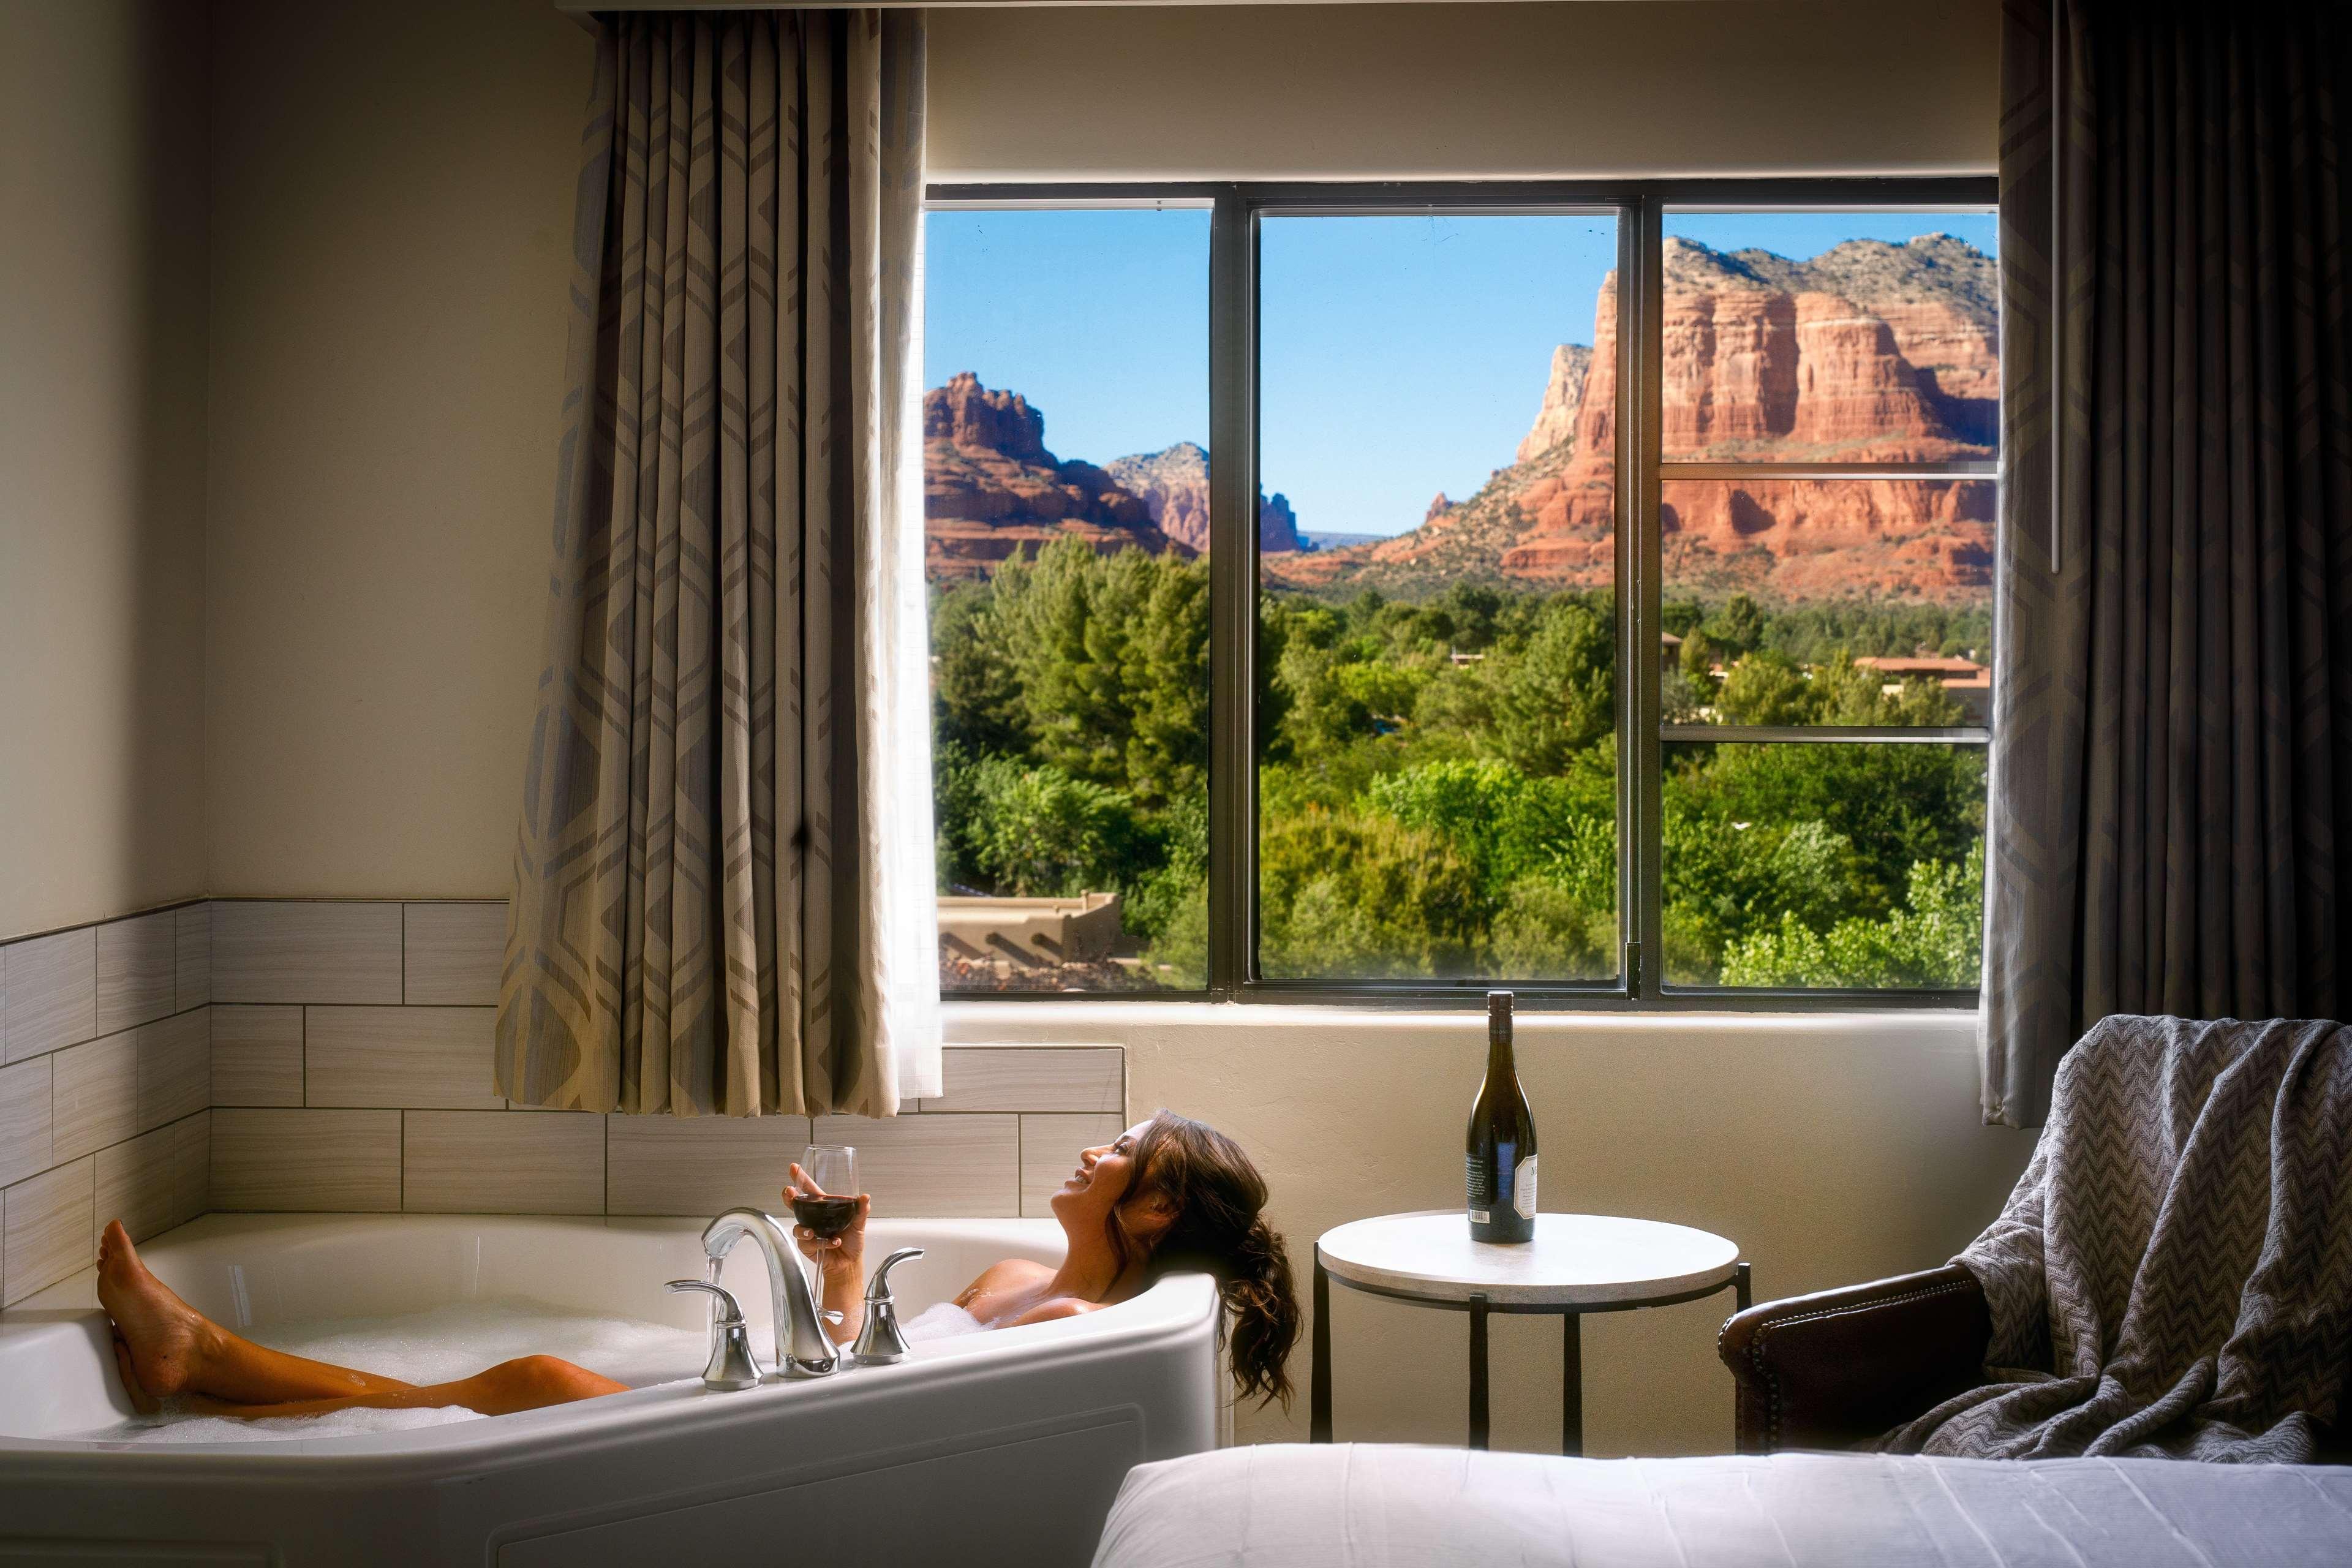 Hilton Sedona Resort at Bell Rock image 41